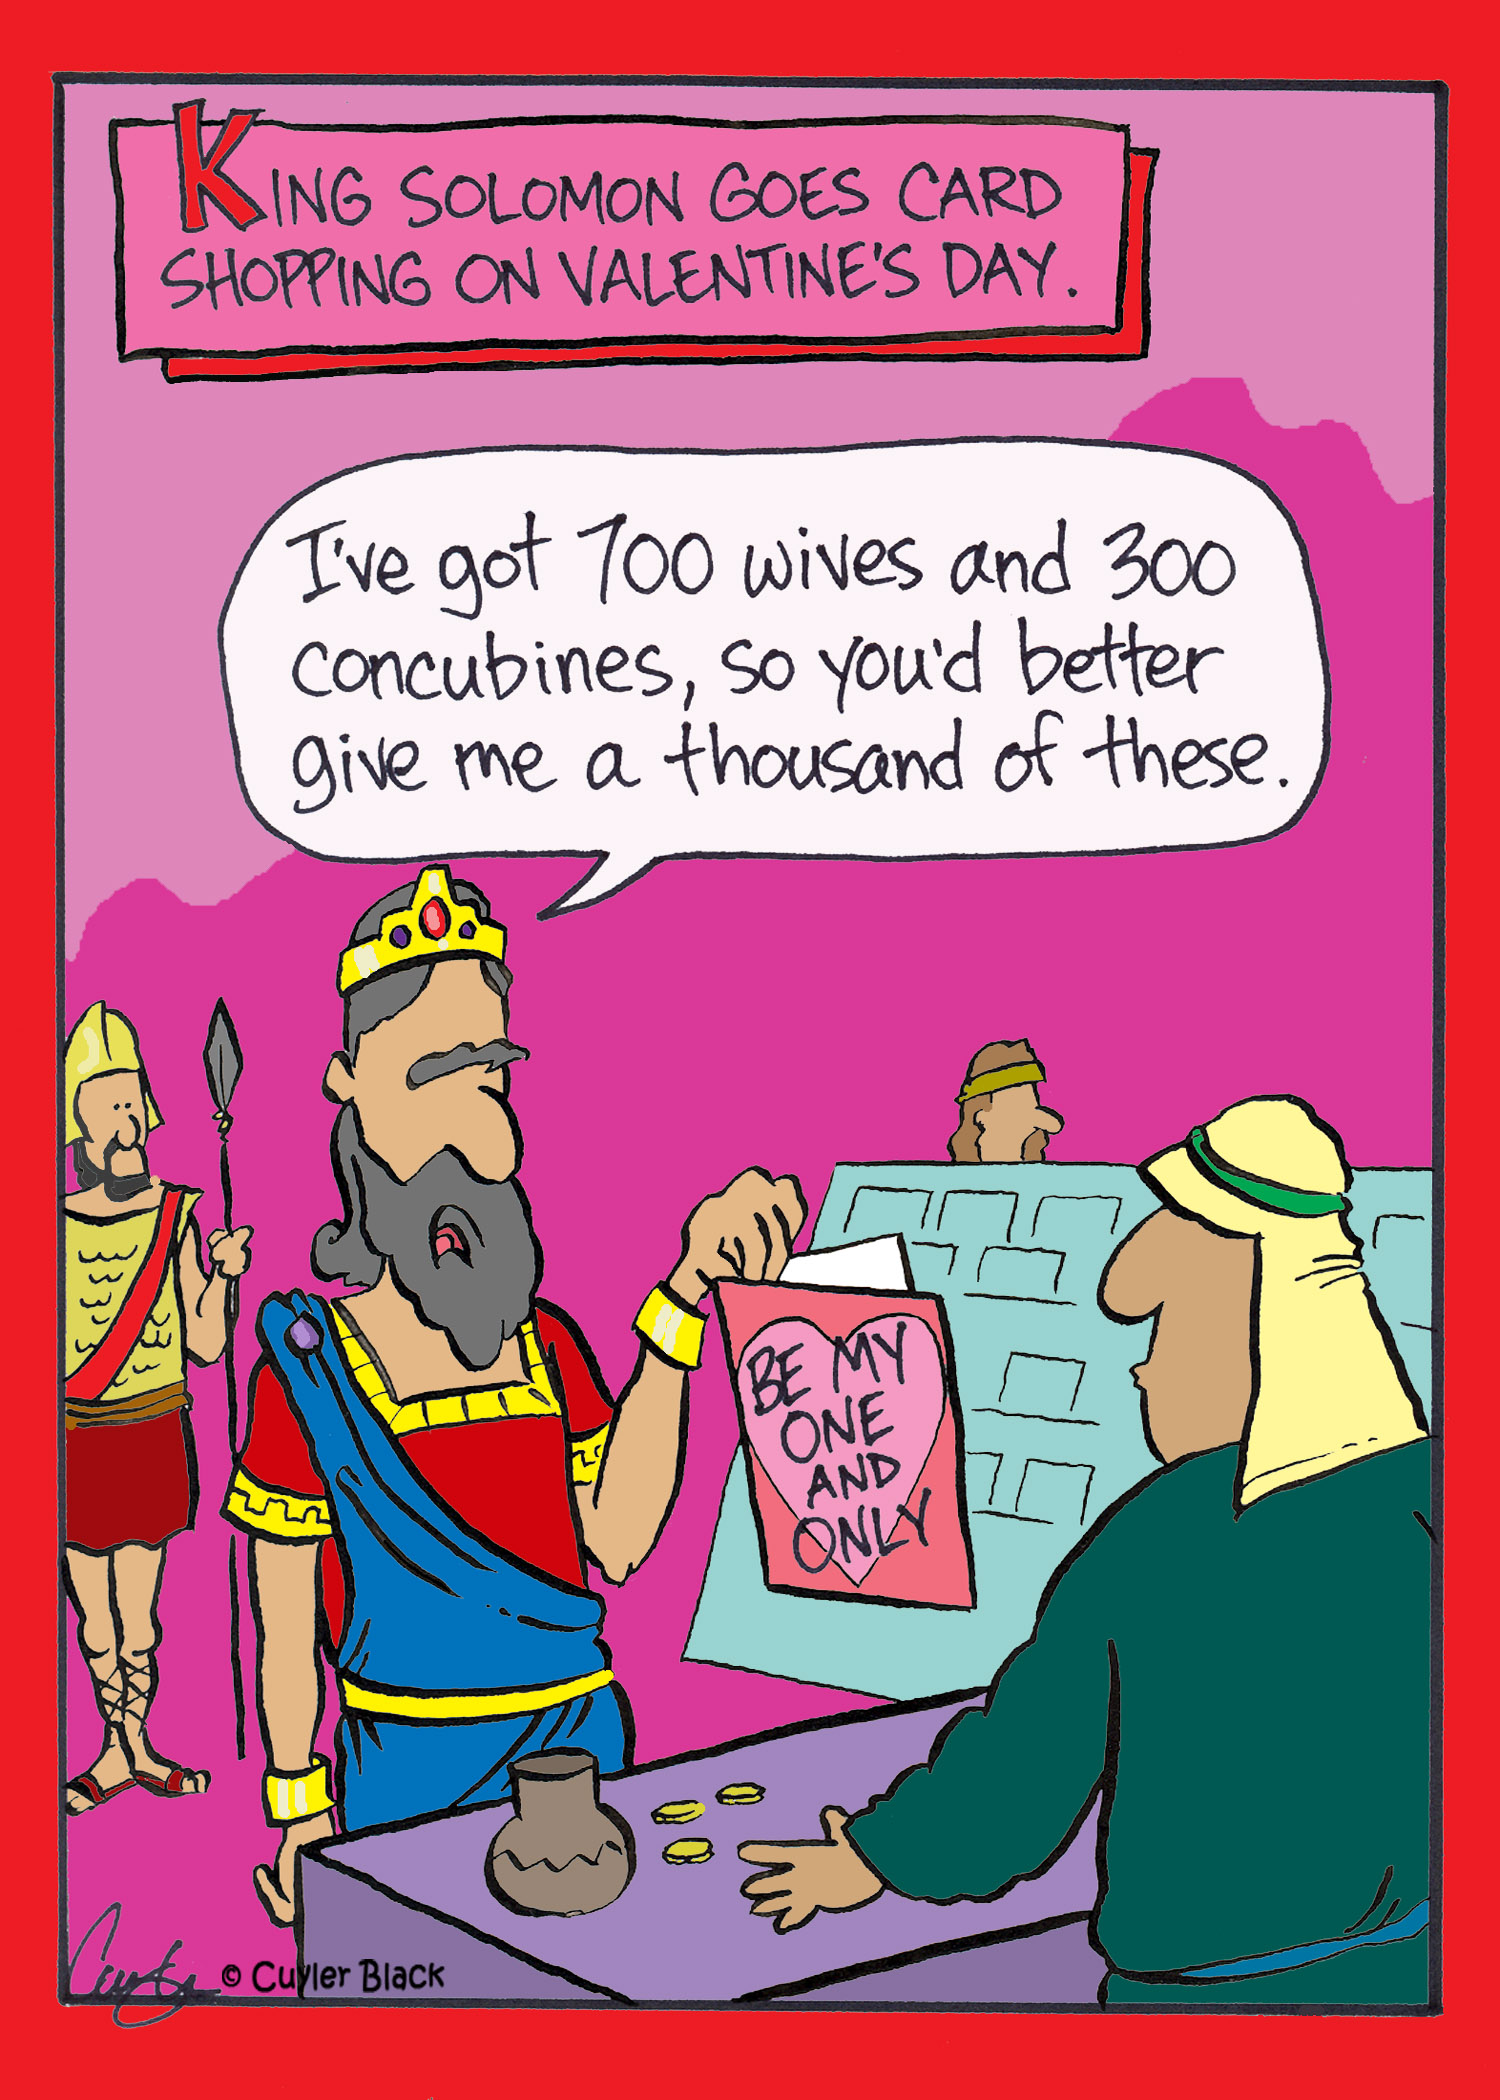 King Solomon's valentines.jpg